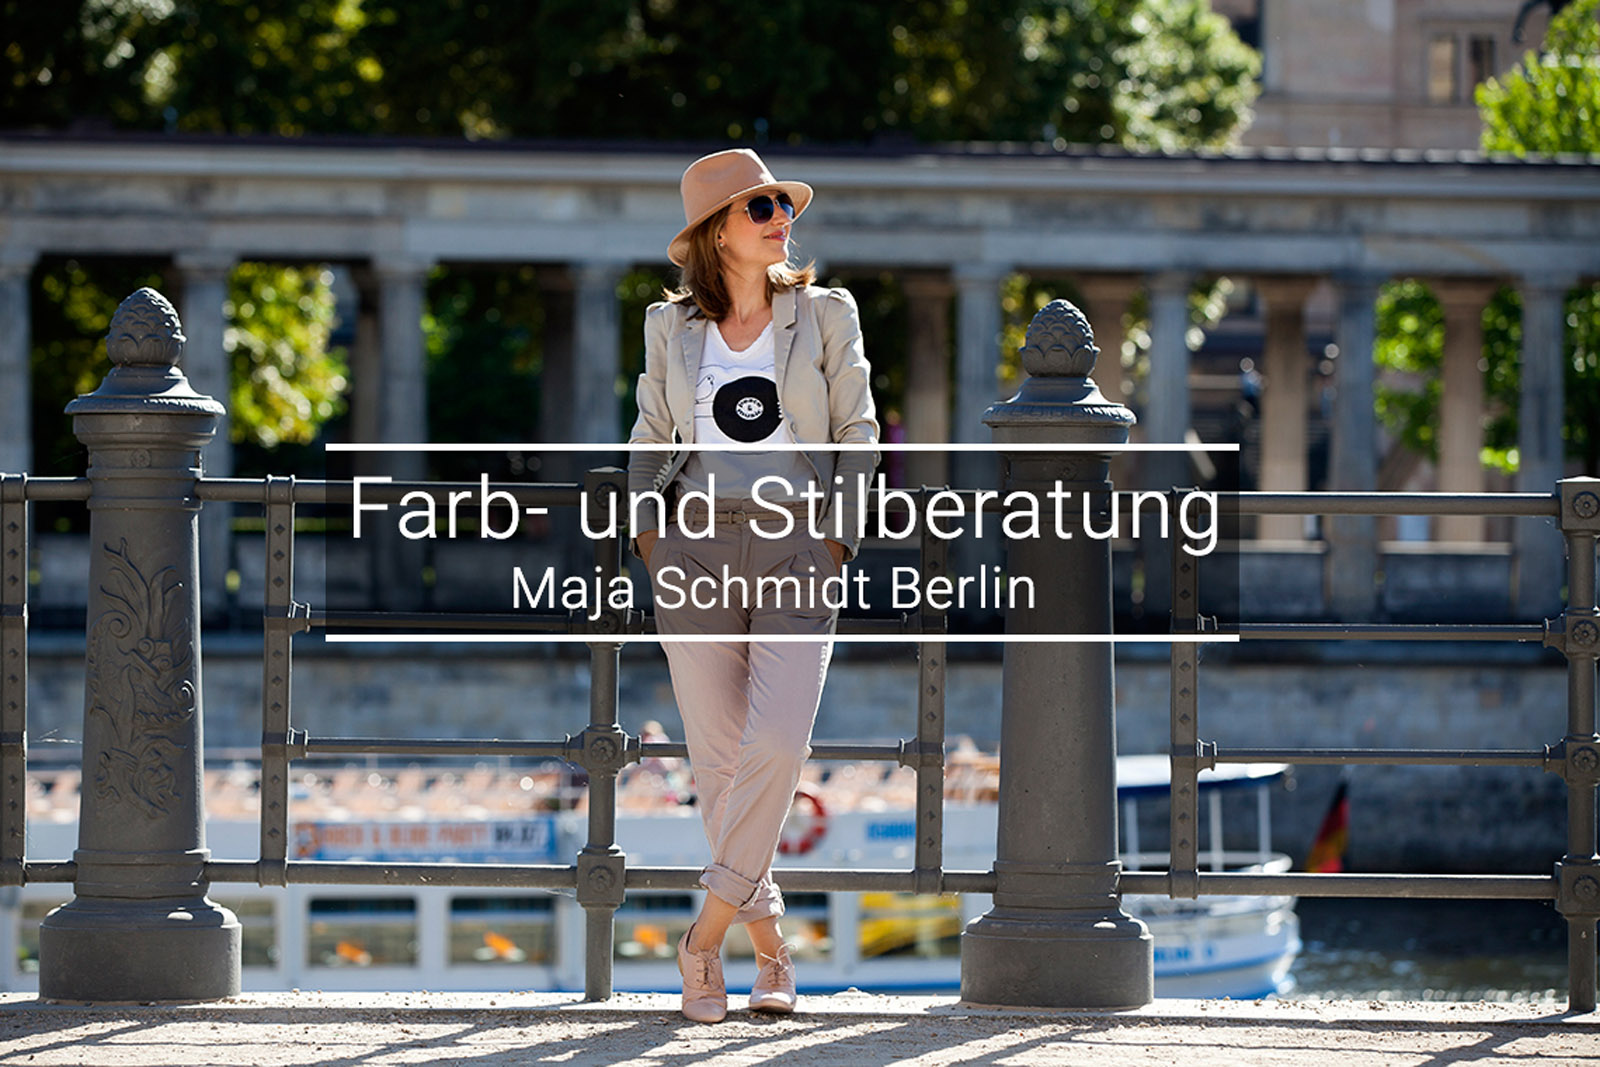 Farbberatung Stilberatung Maja Schmidt Berlin Foto Startseite